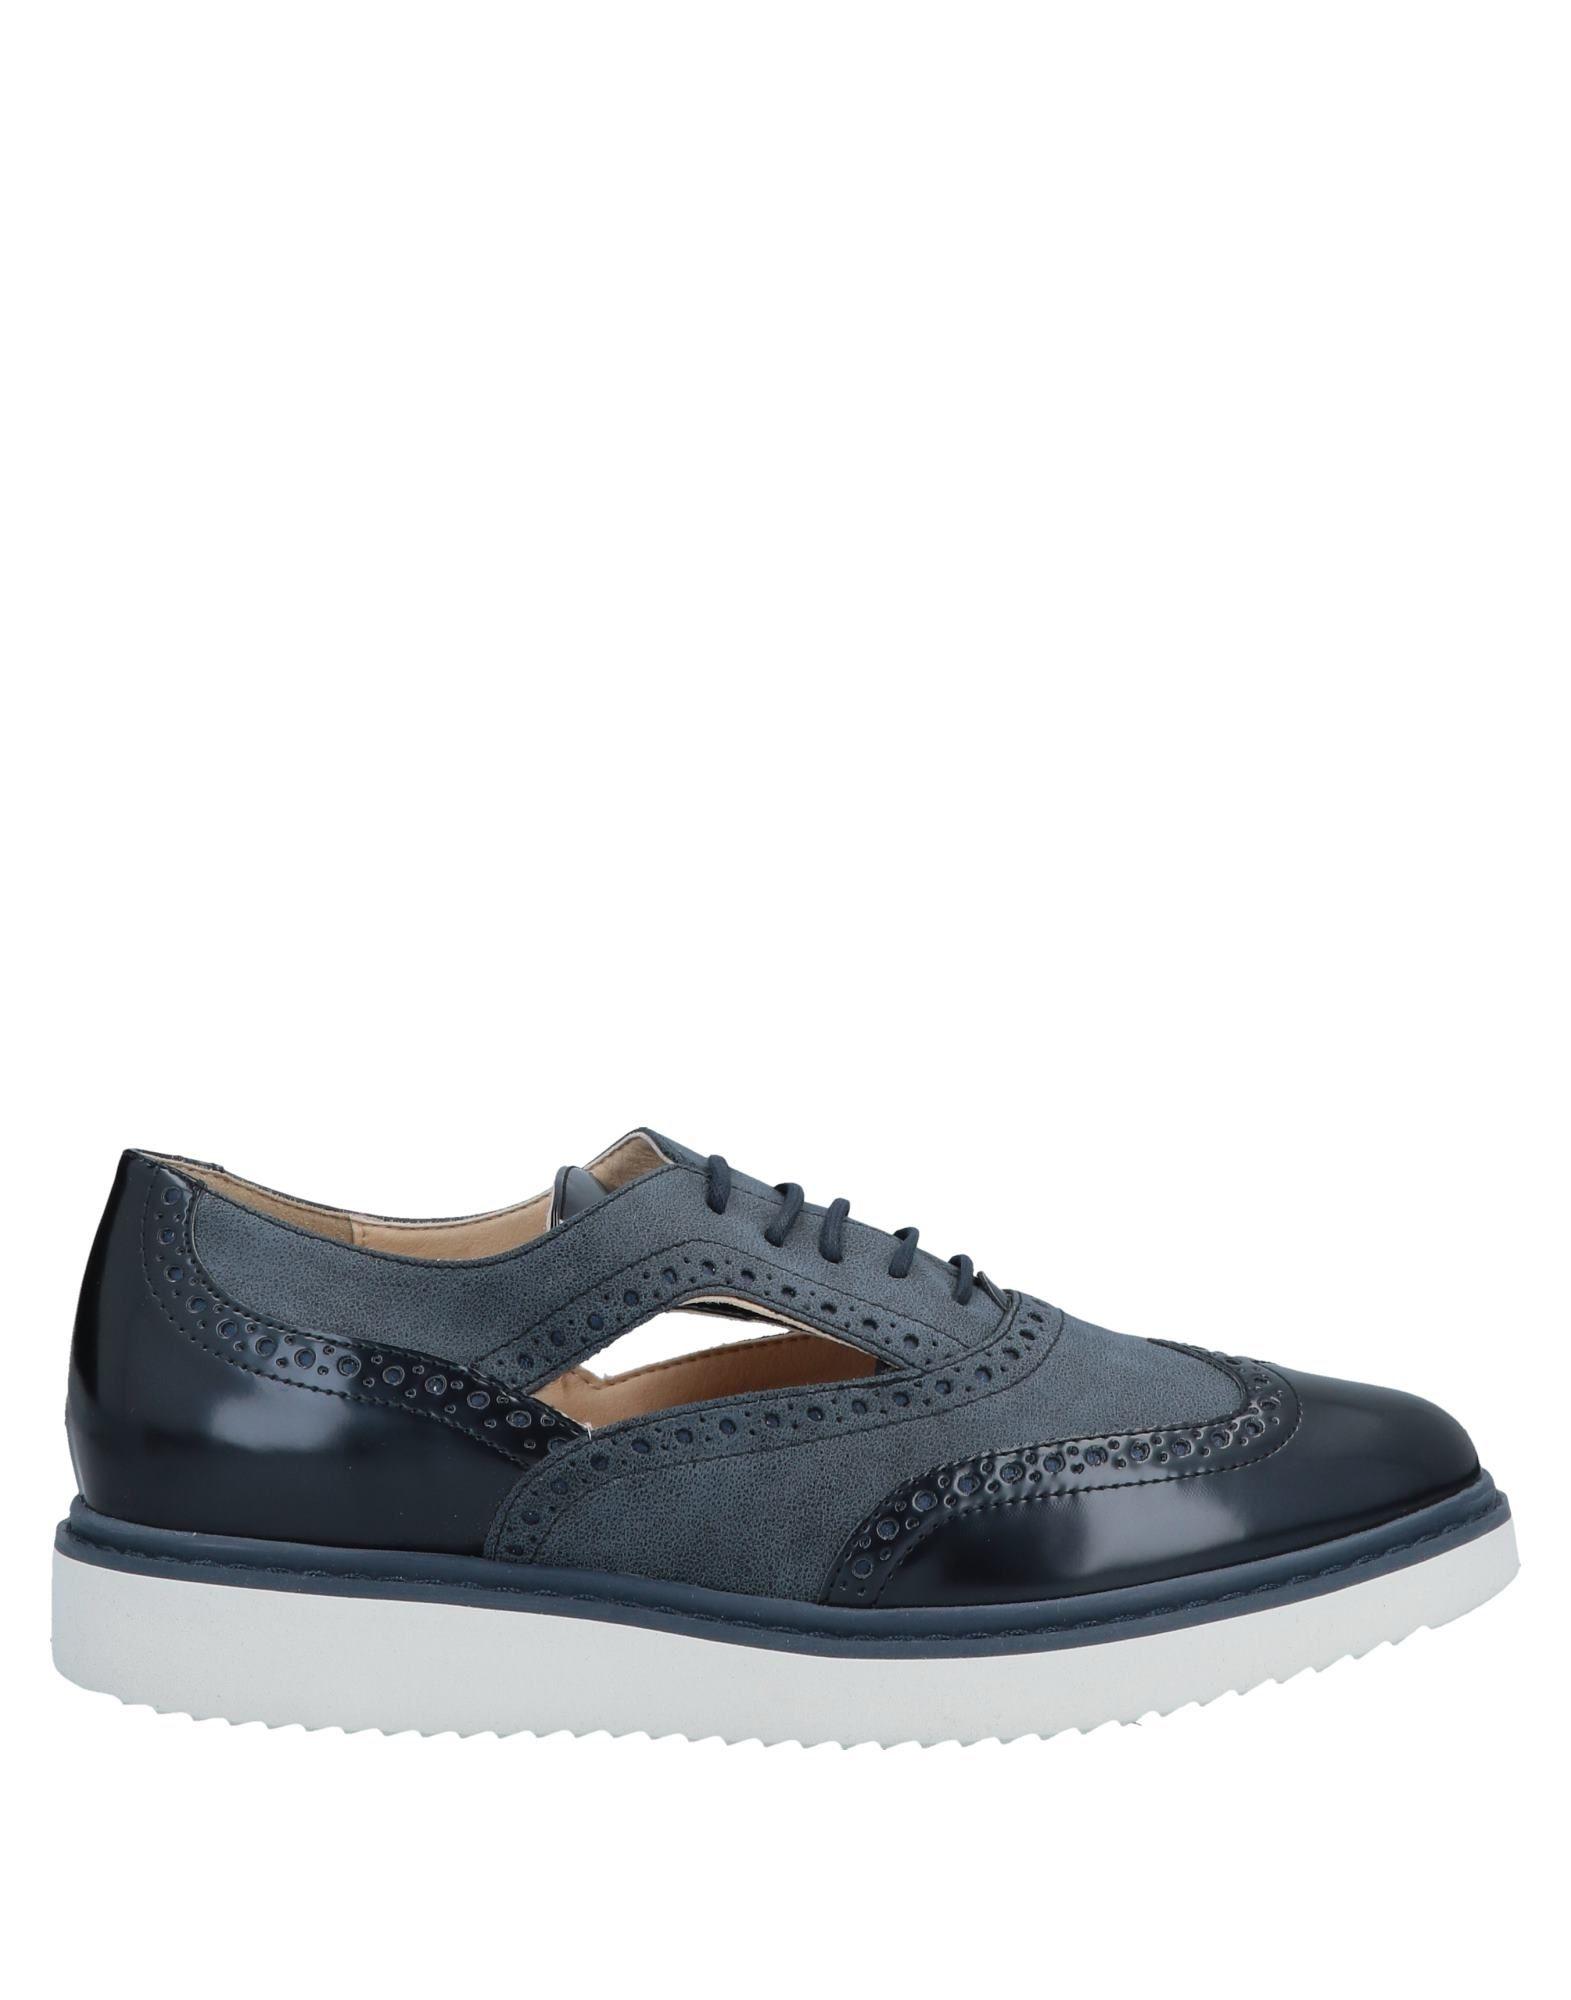 GEOX Обувь на шнурках 3 3 trepuntotre обувь на шнурках